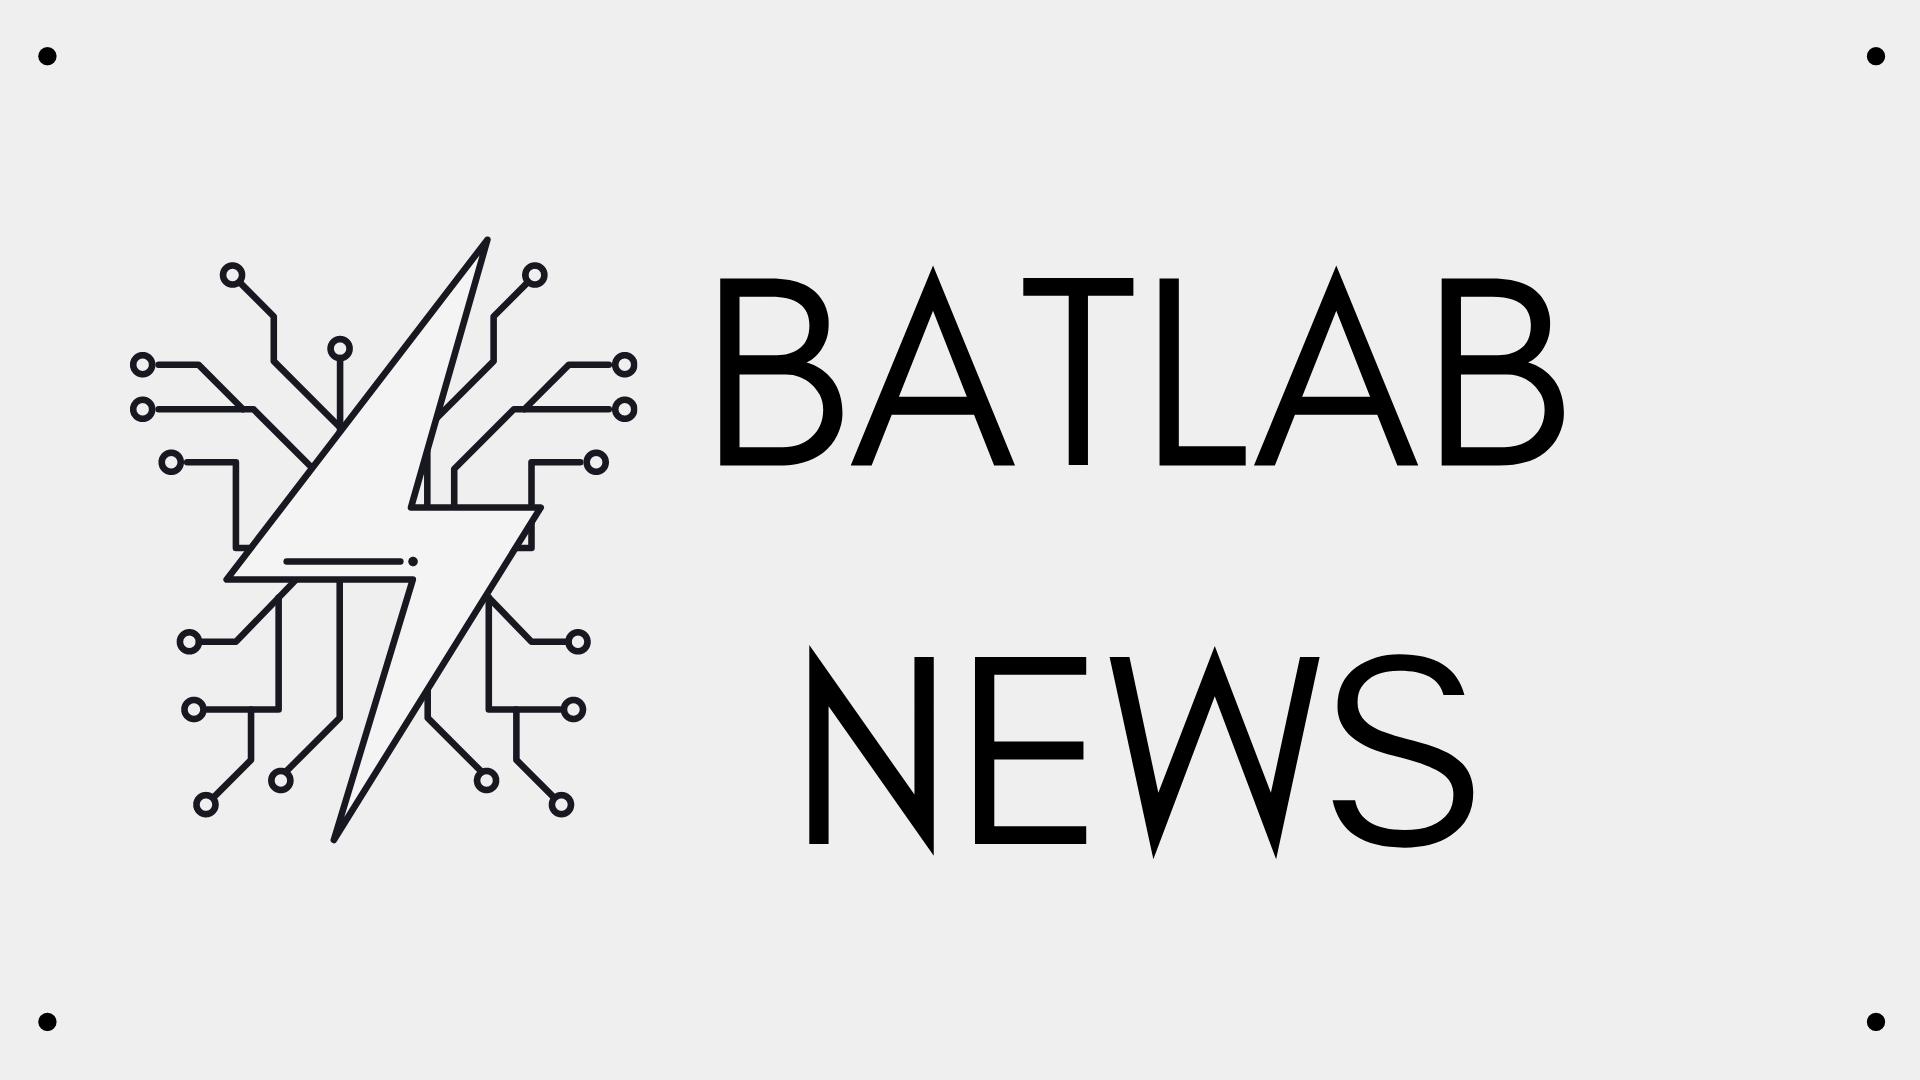 Batlab News